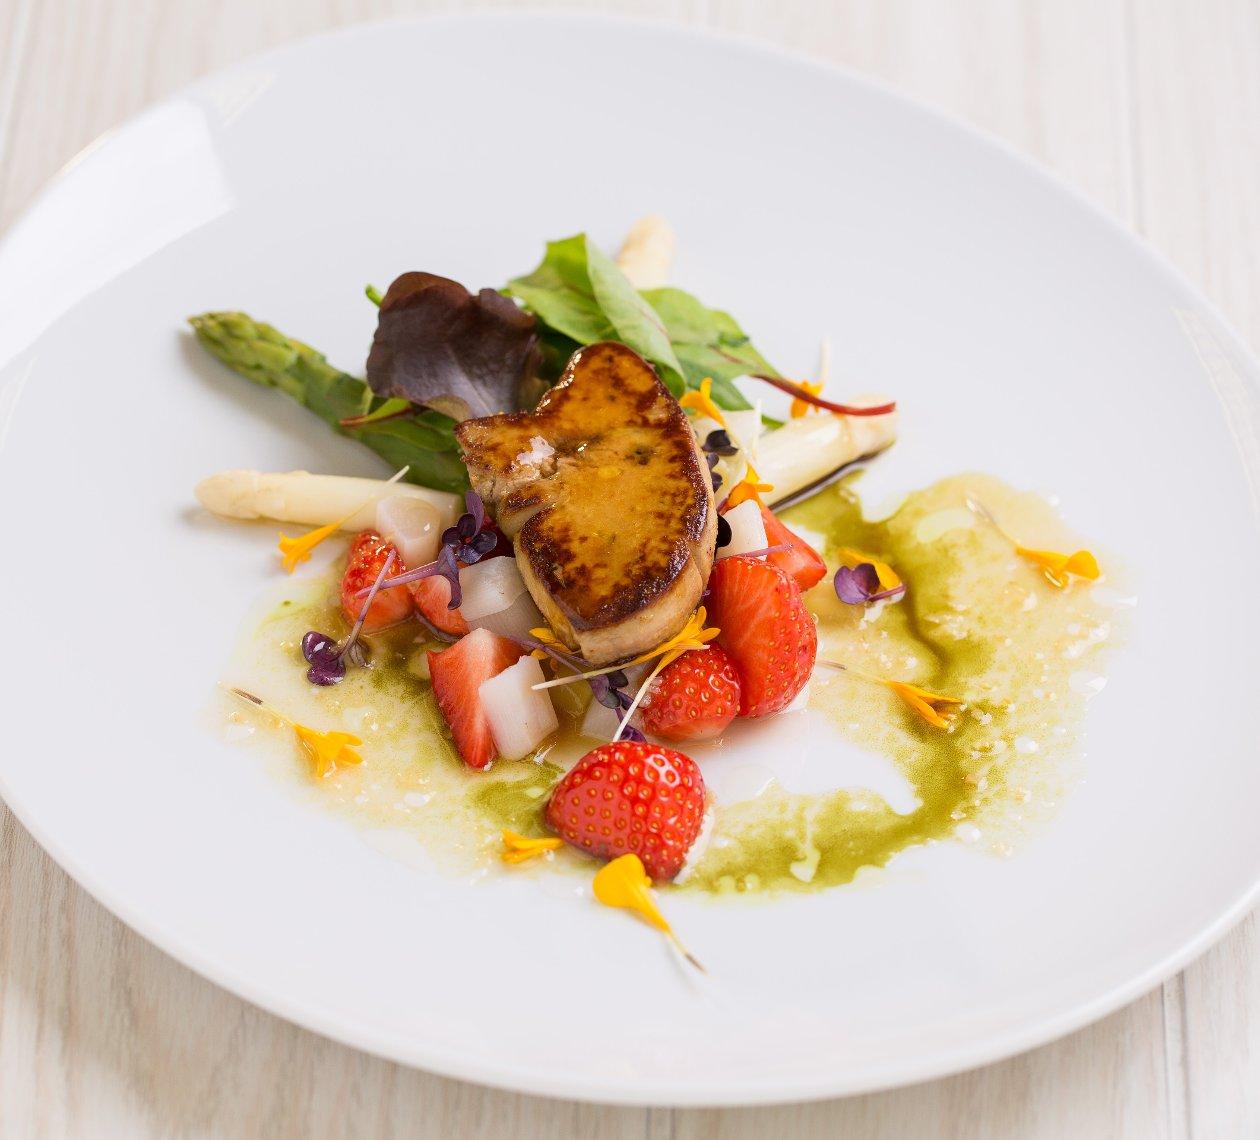 Roston sült libamáj, epres-spárga salátával.              (2)